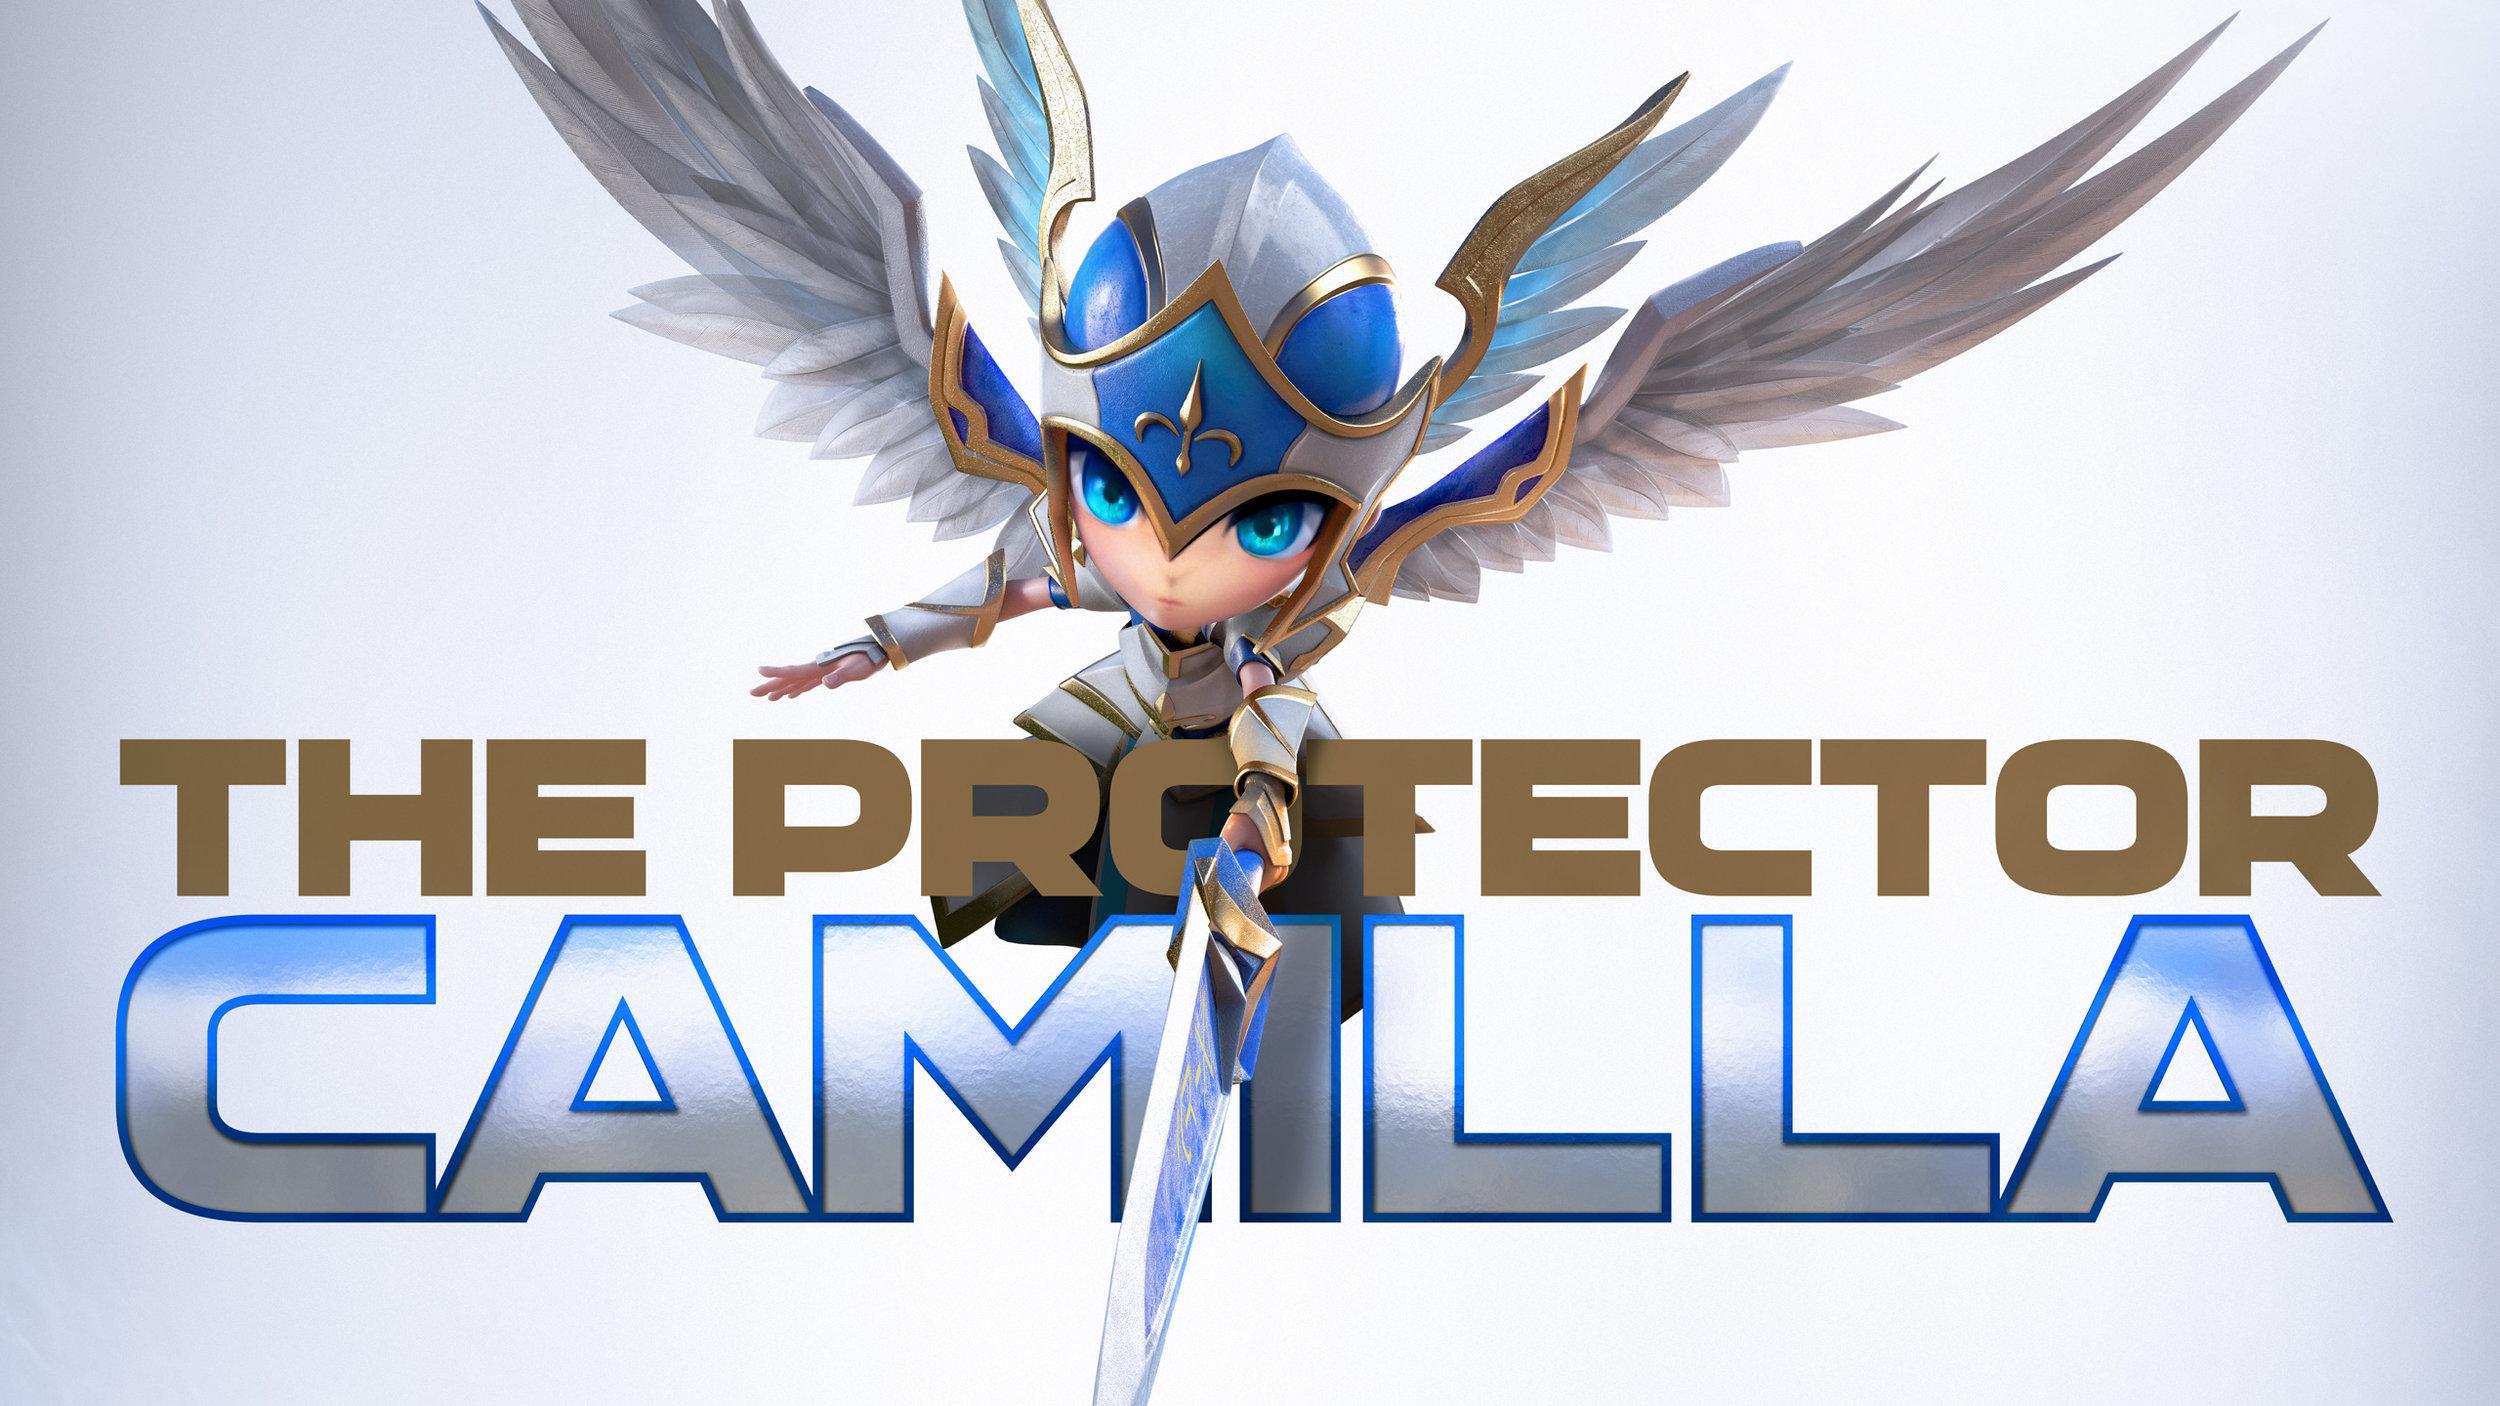 Meet Camilla